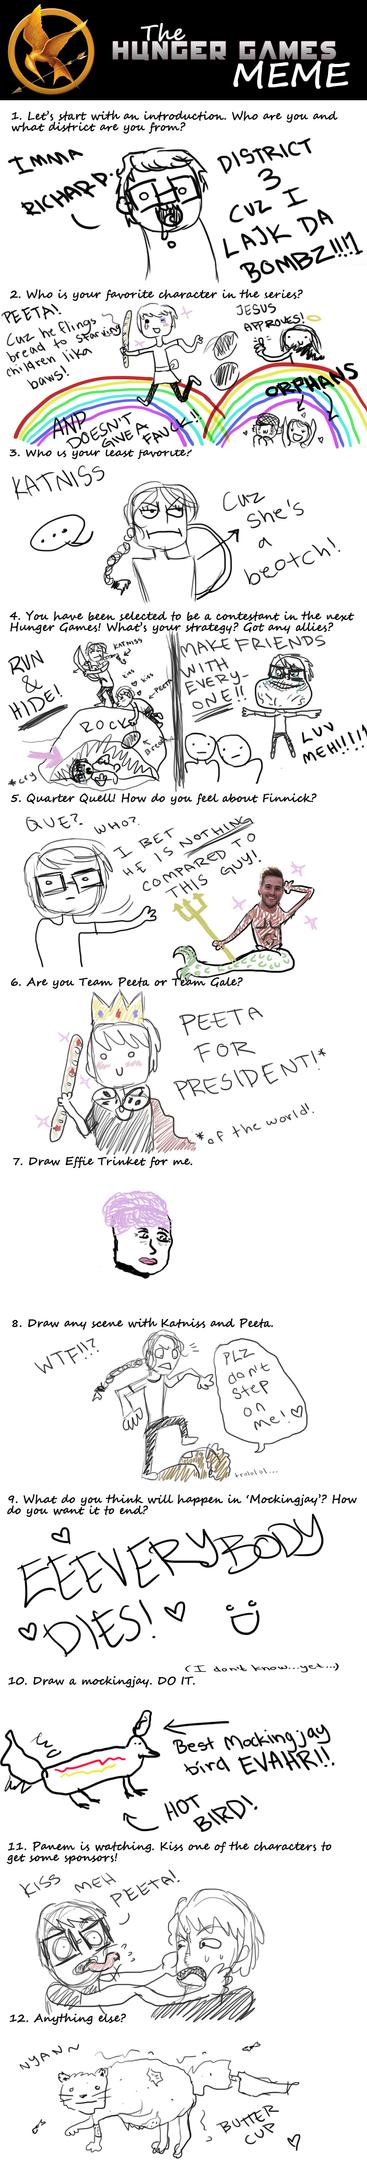 The Hunger Games meme by richyman95